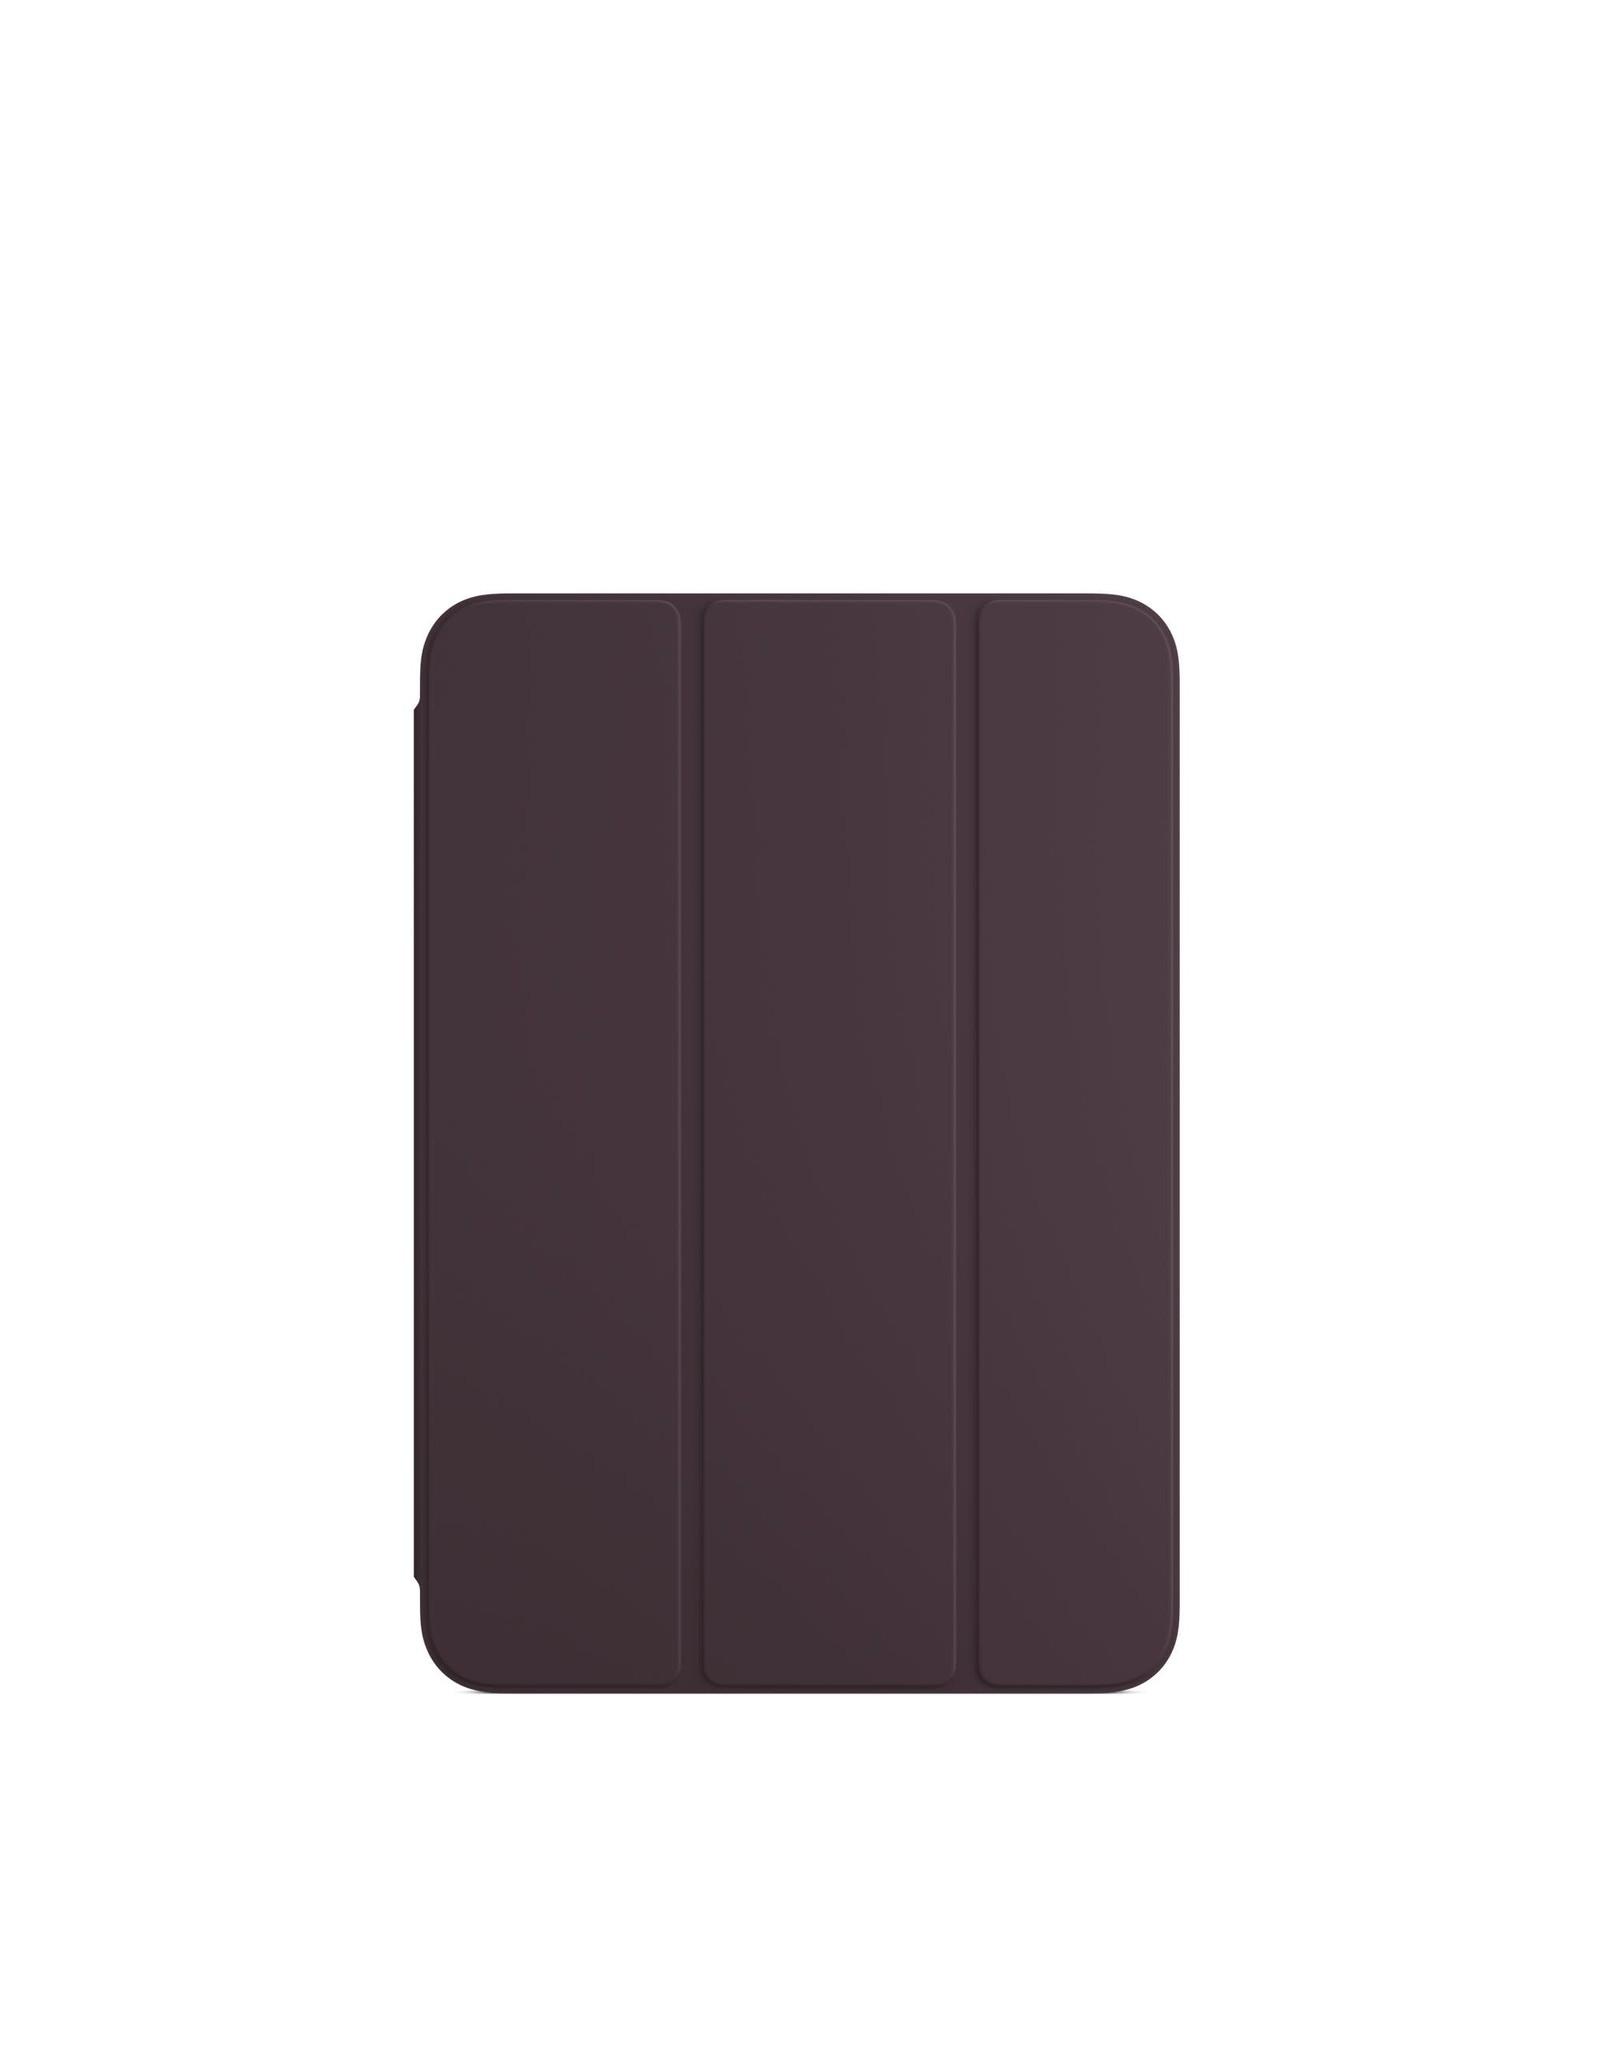 Apple Apple Smart Folio for iPad mini (6th generation) - Dark Cherry